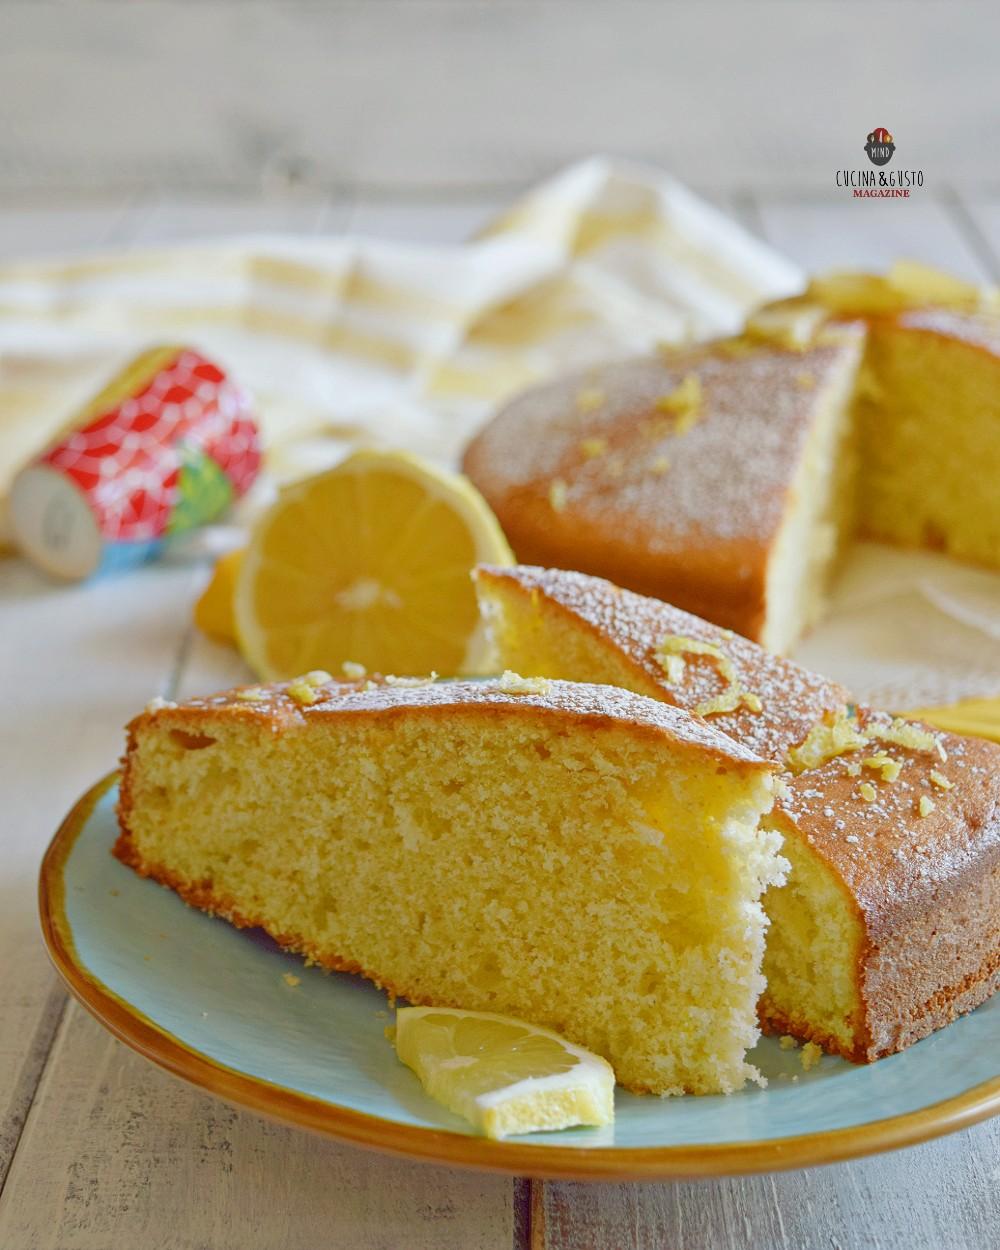 Torta al limone soffice e profumata senza burro